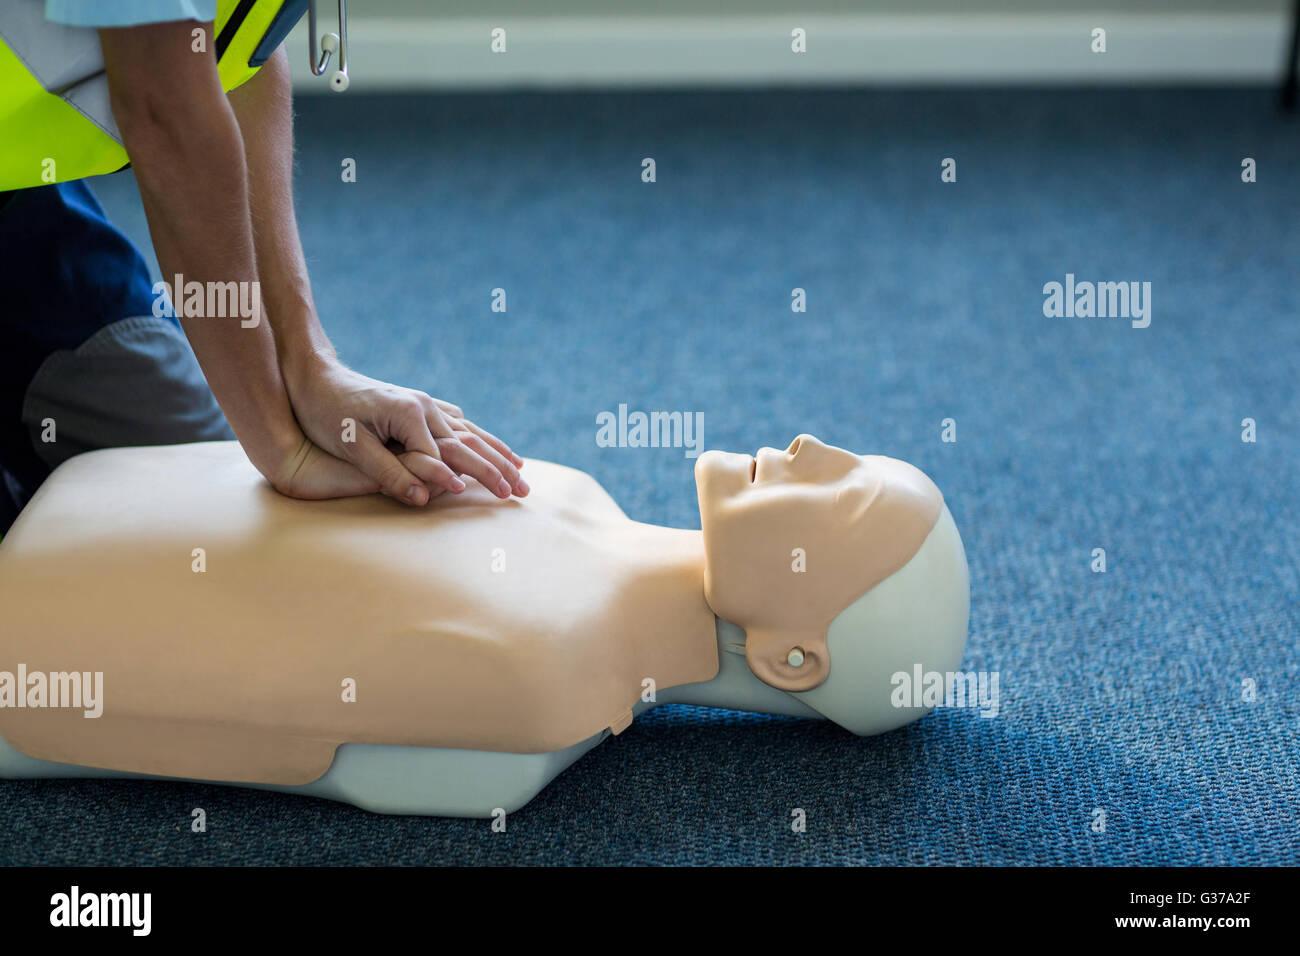 Female paramedic during cardiopulmonary resuscitation training - Stock Image